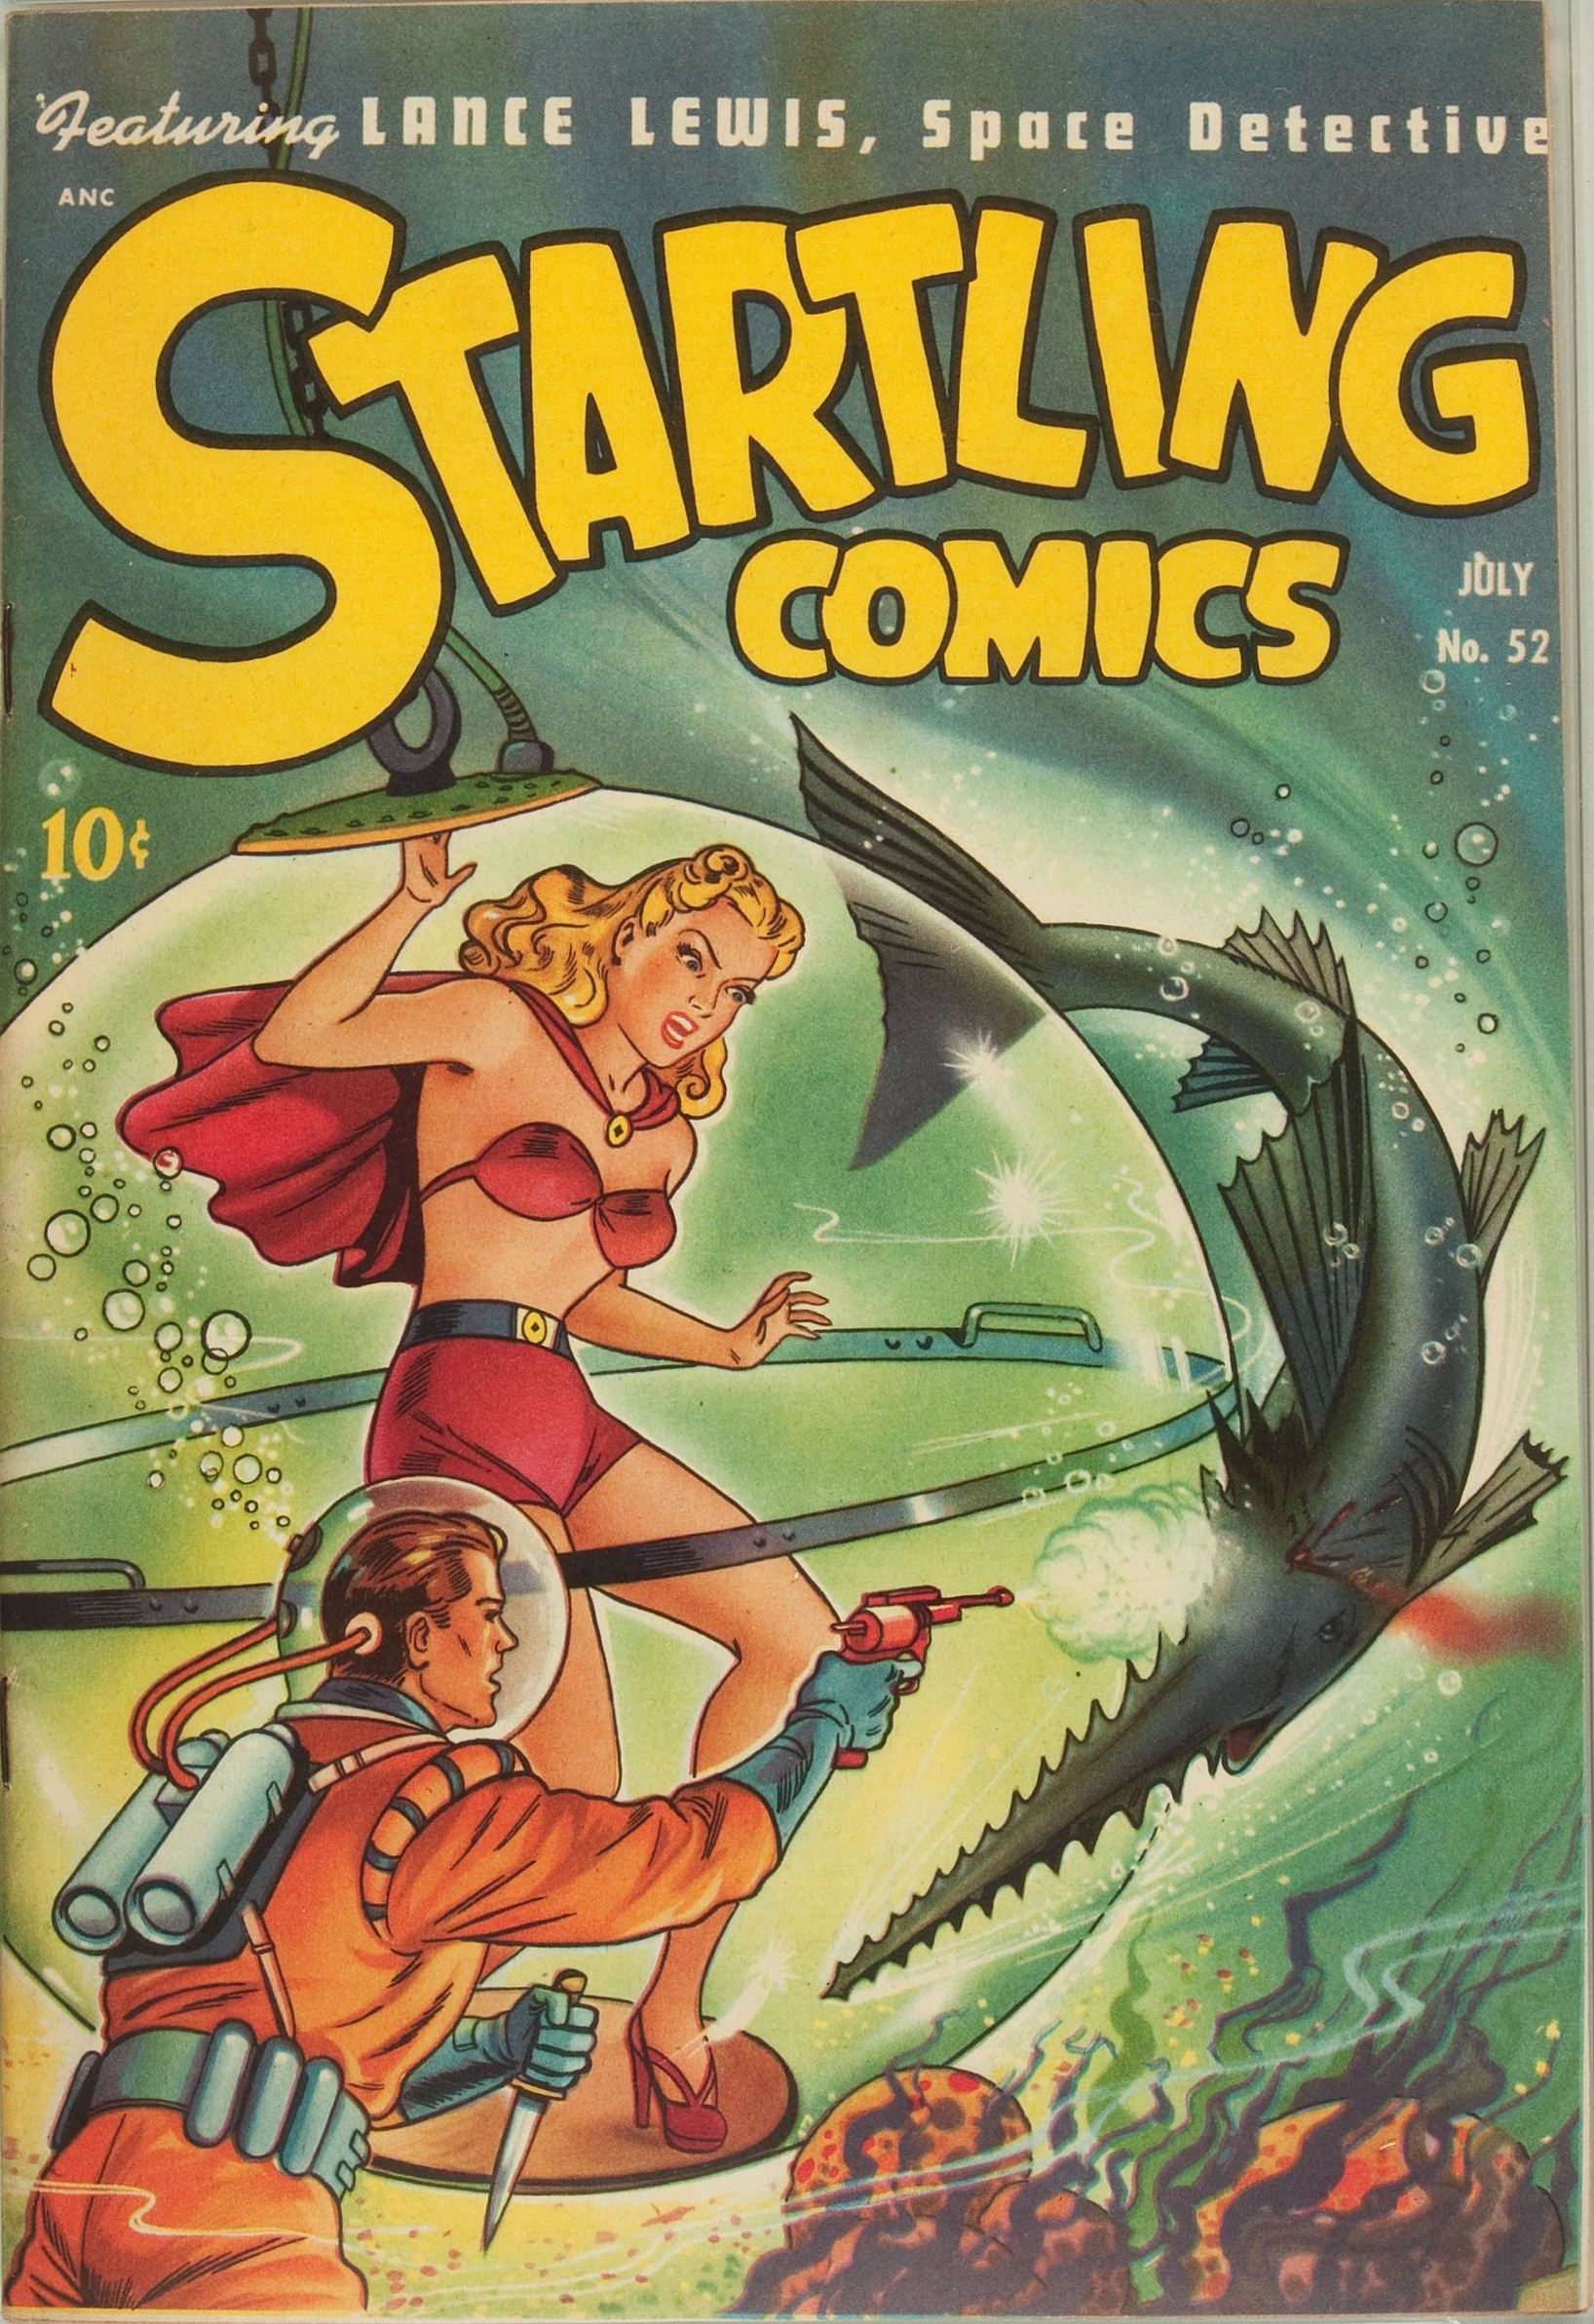 Startling Comics Pics, Comics Collection